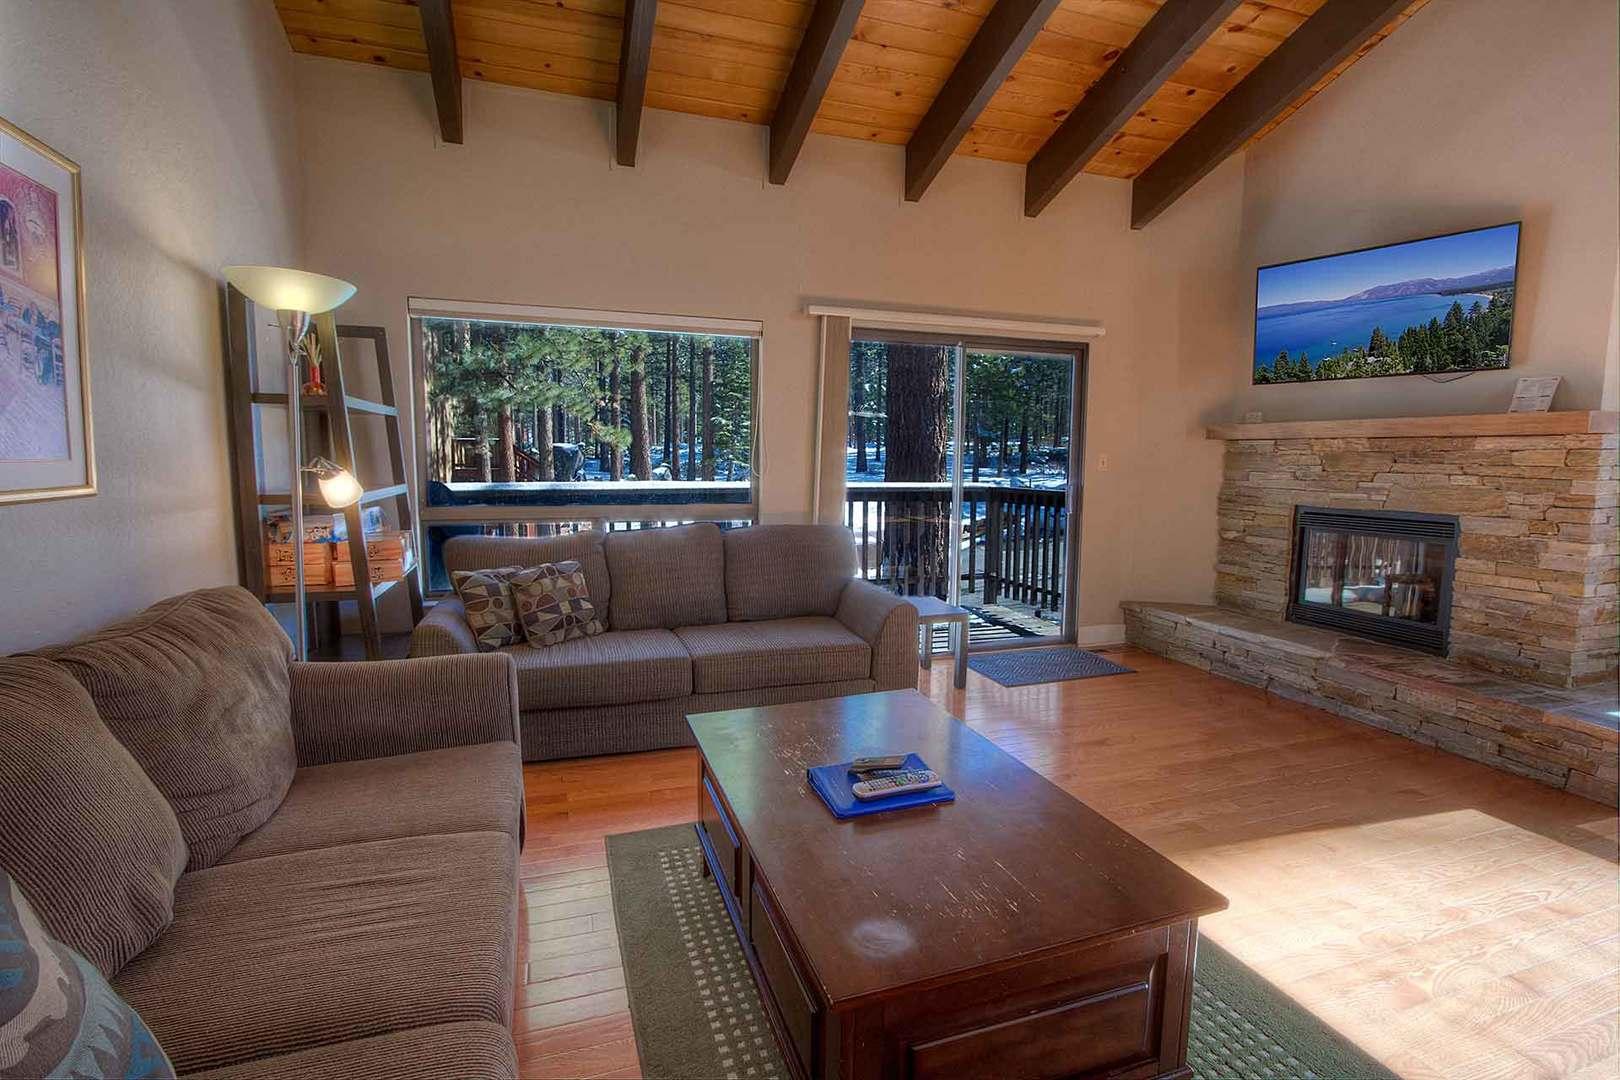 lvc0899 Living room